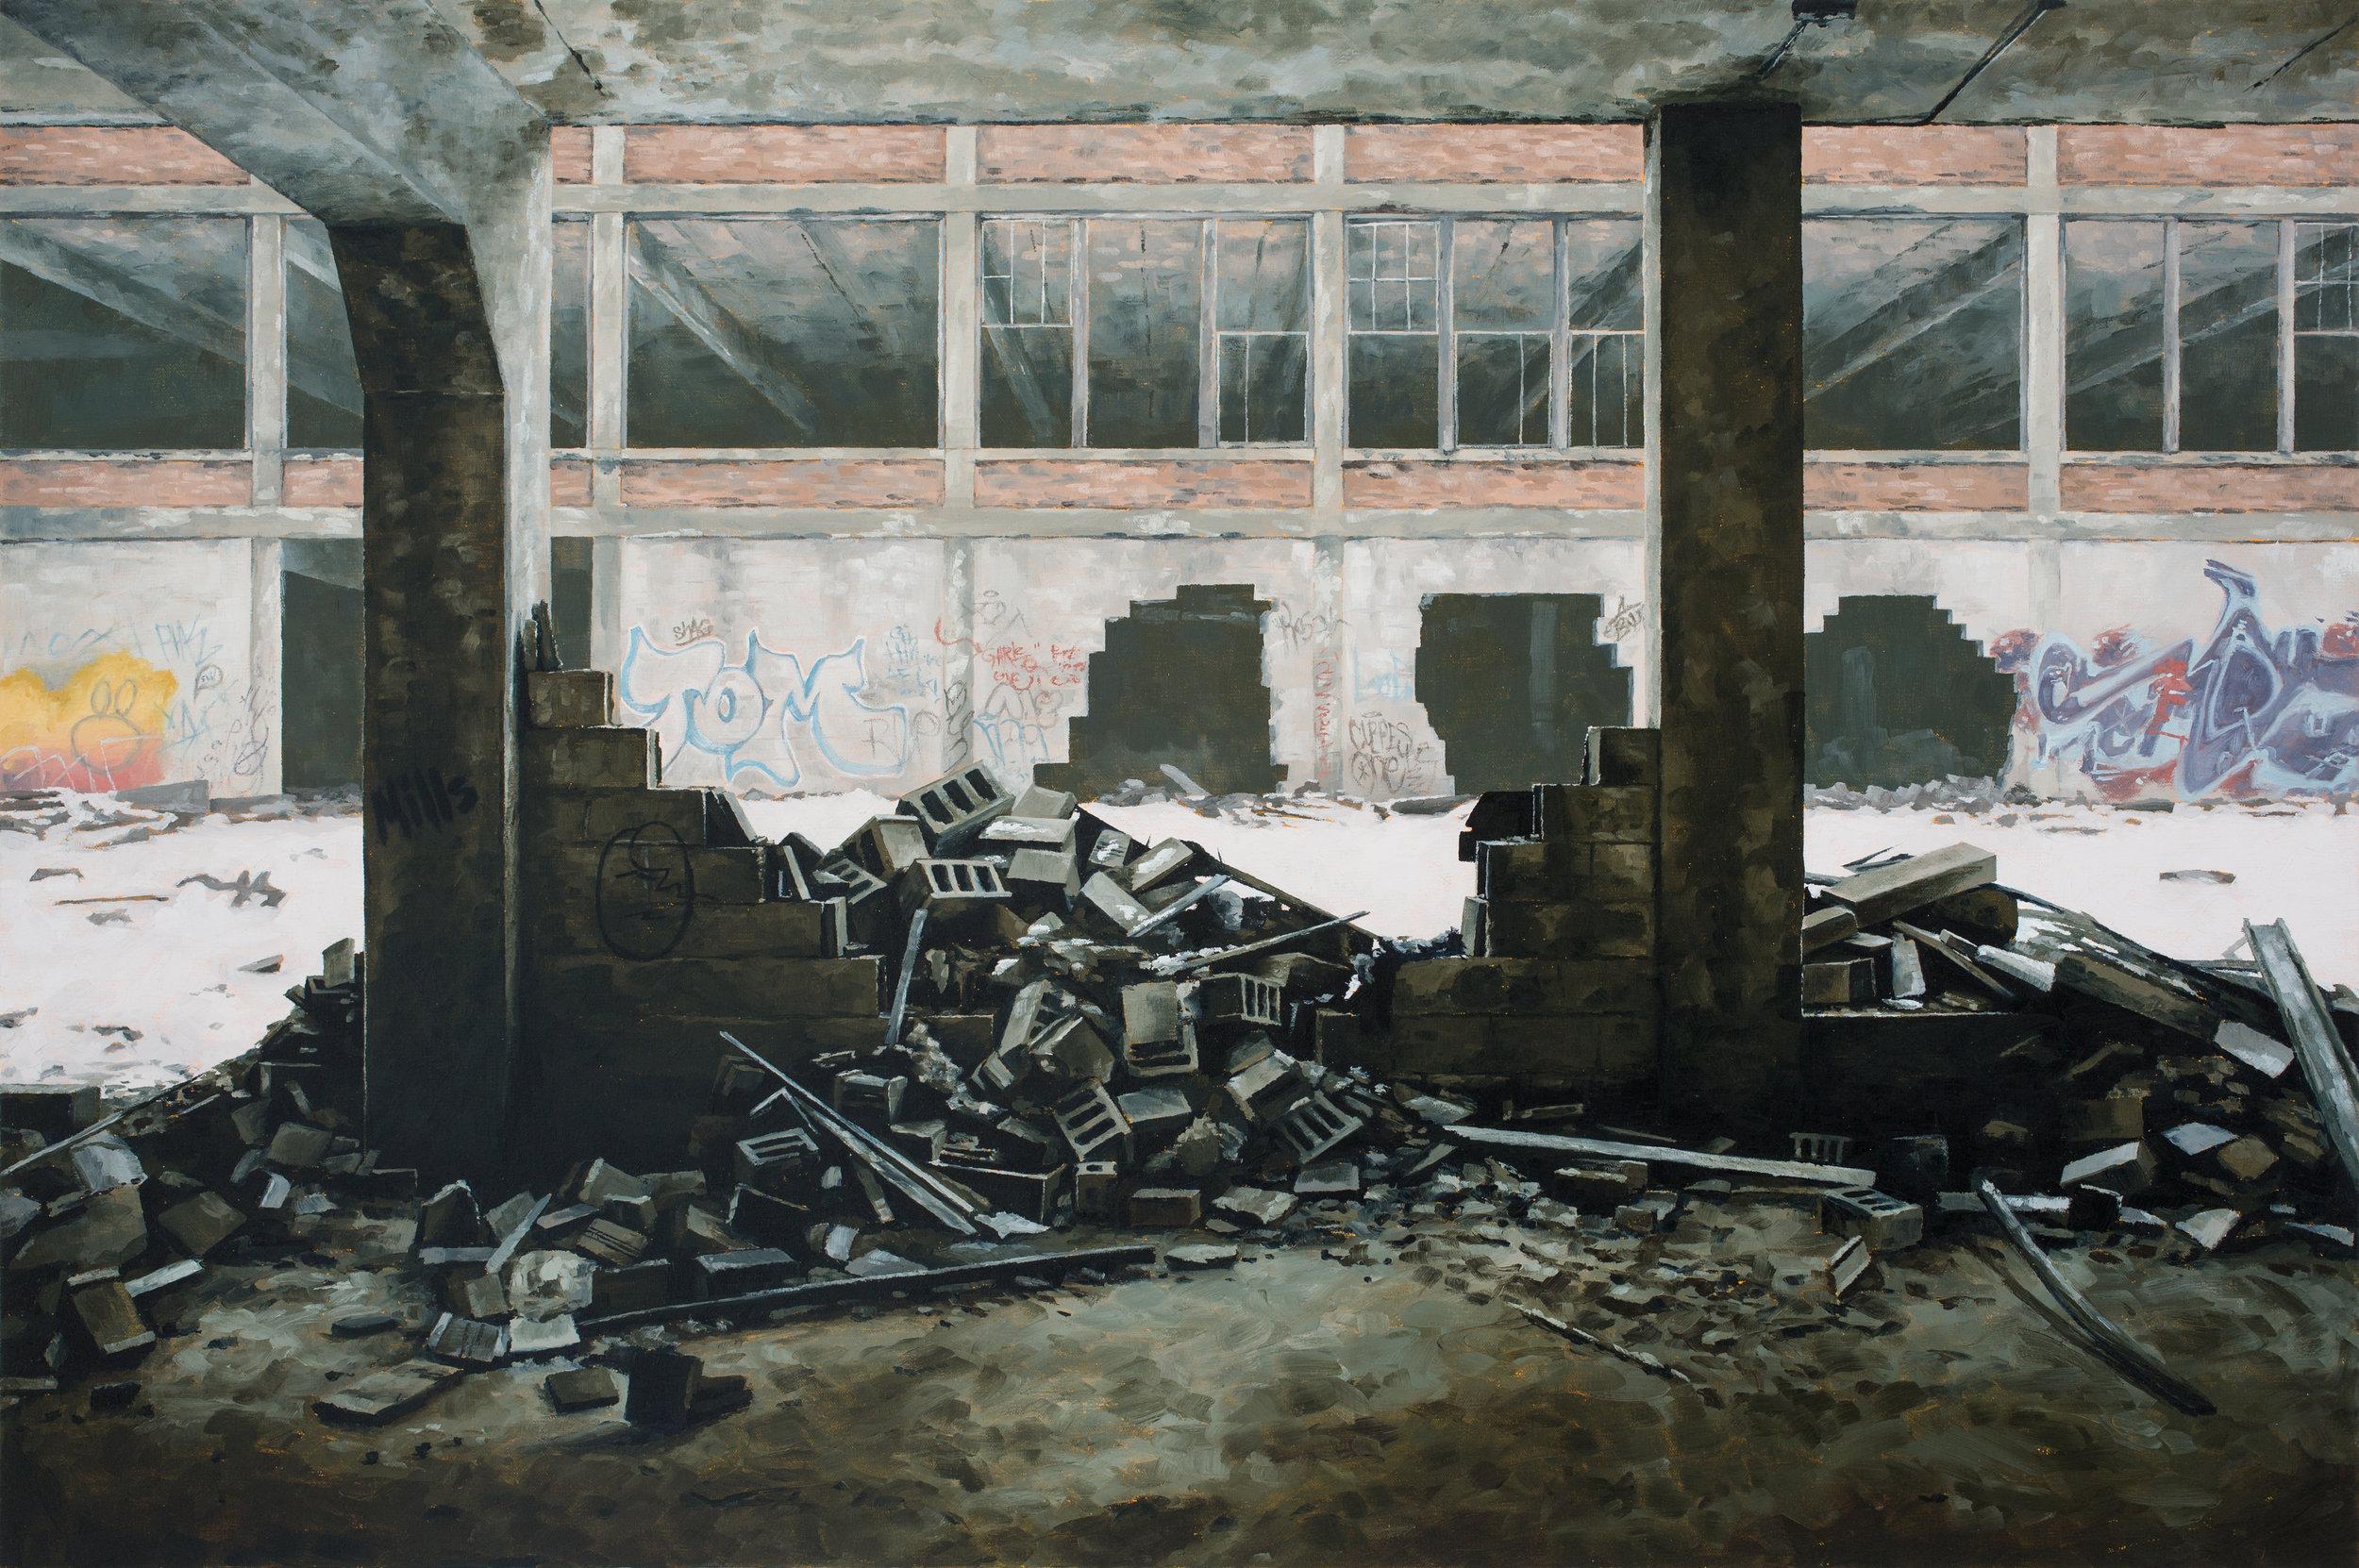 <b>STEPHANIE BUER</b><i><br>TOM</i><br>oil on canvas<br> 28 x 42 inches<br></br>